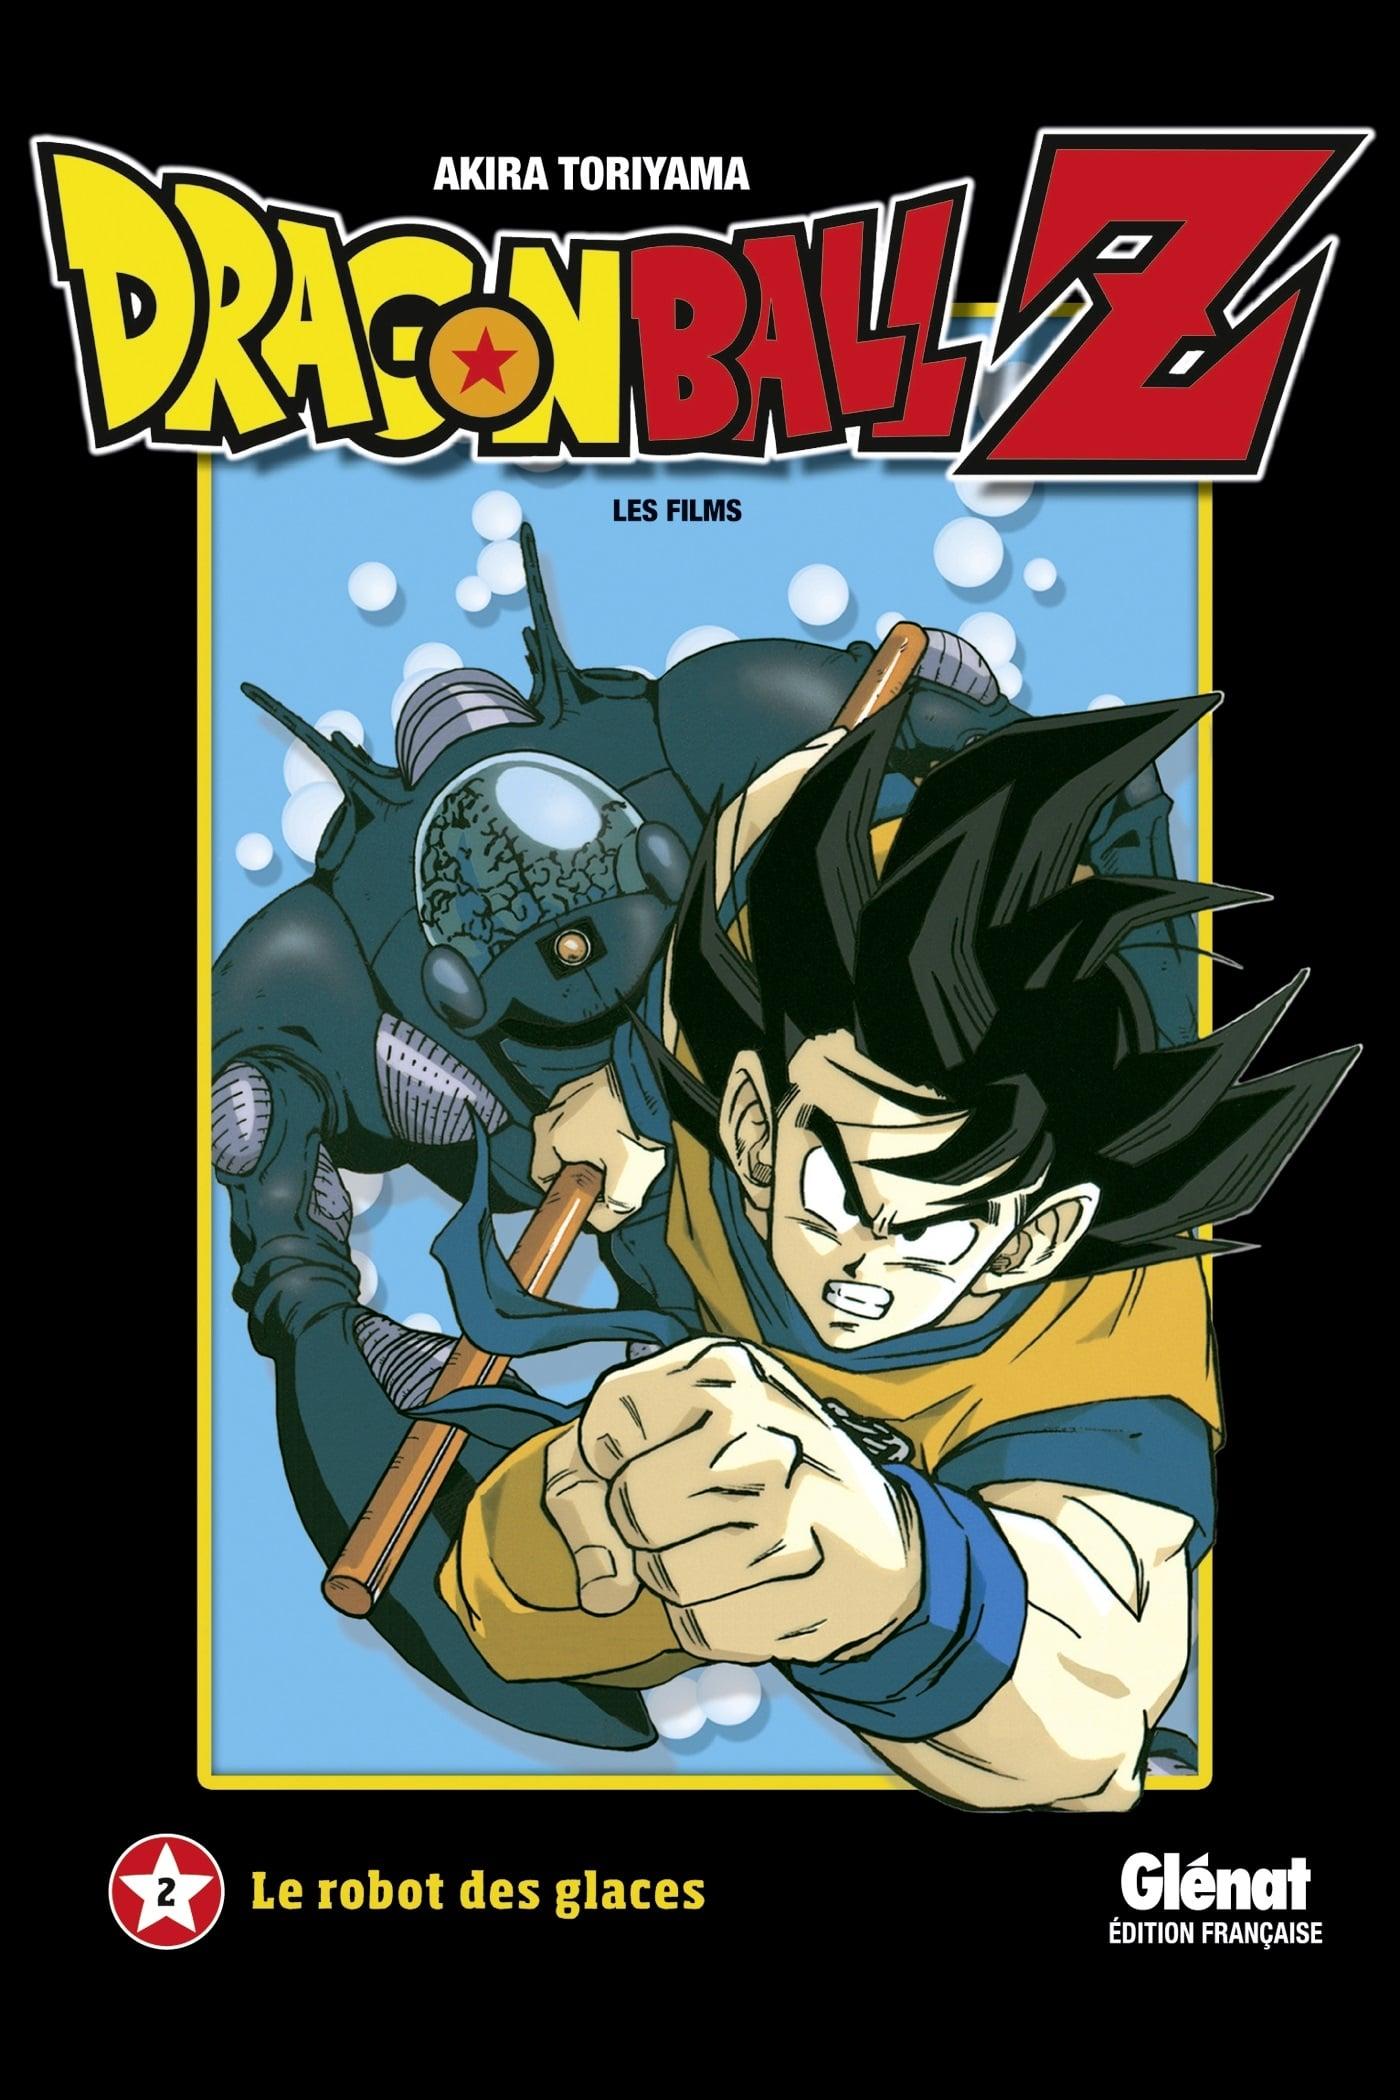 Dragon Ball Z - Le Robot des Glaces